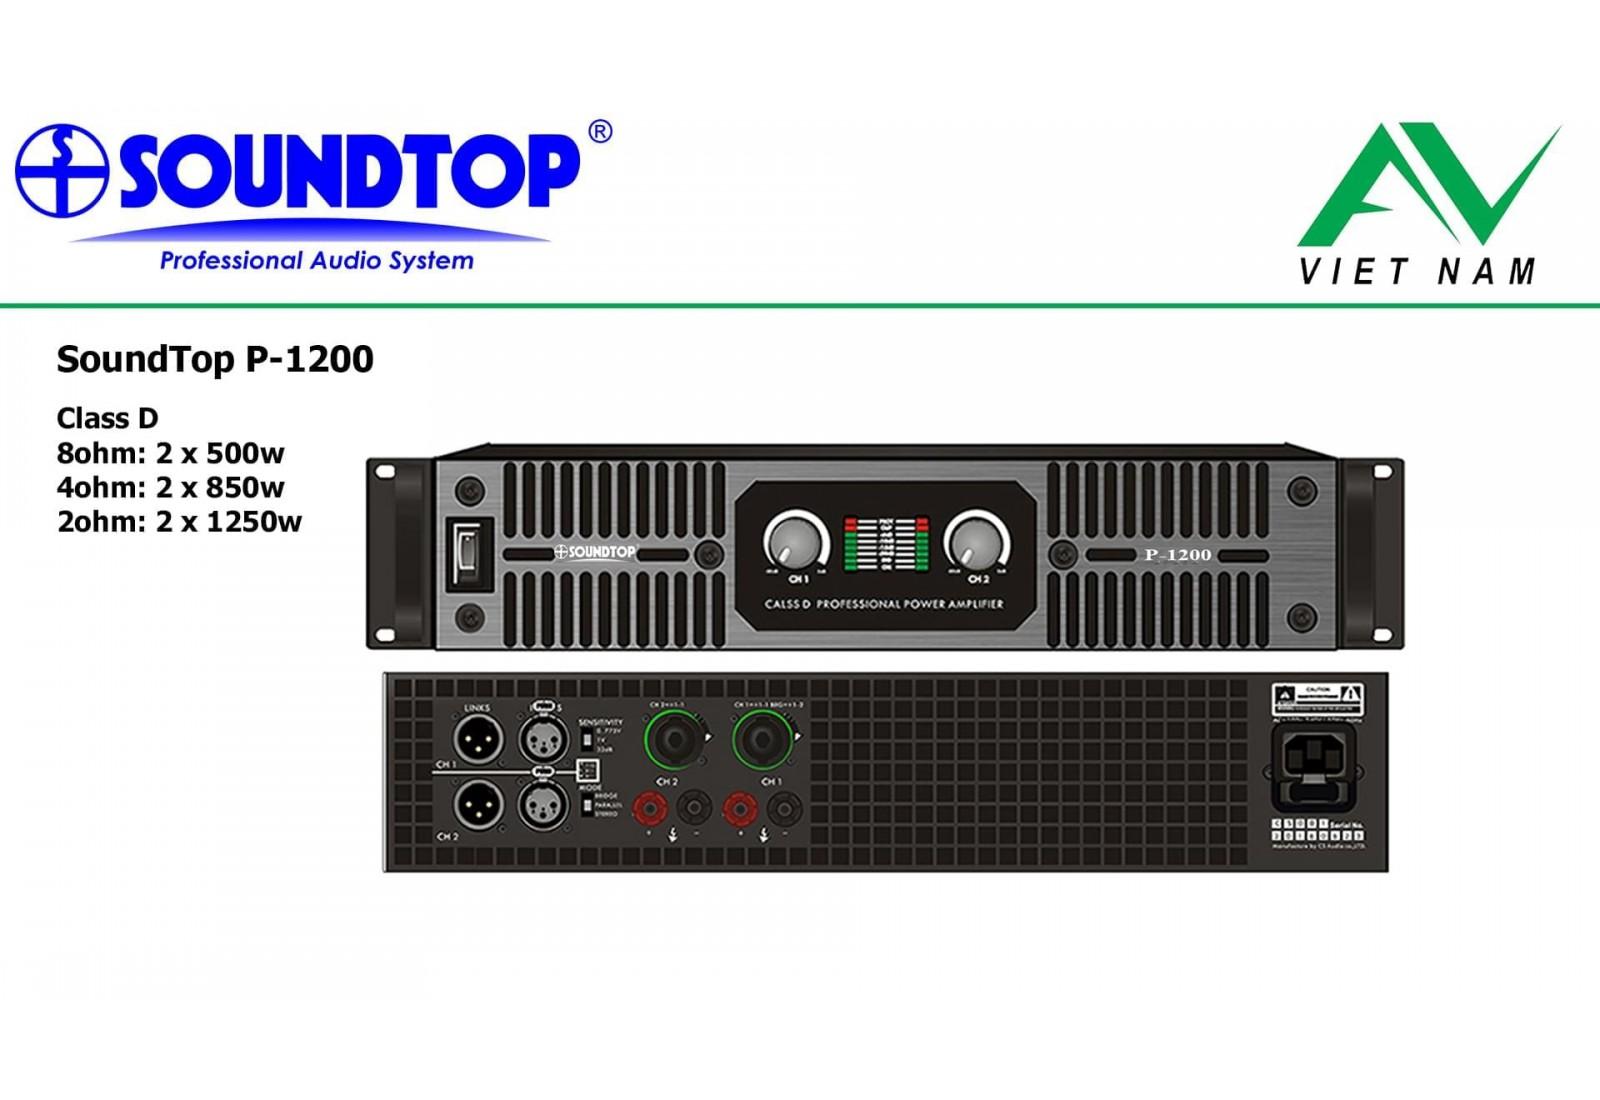 SoundTop P-1200